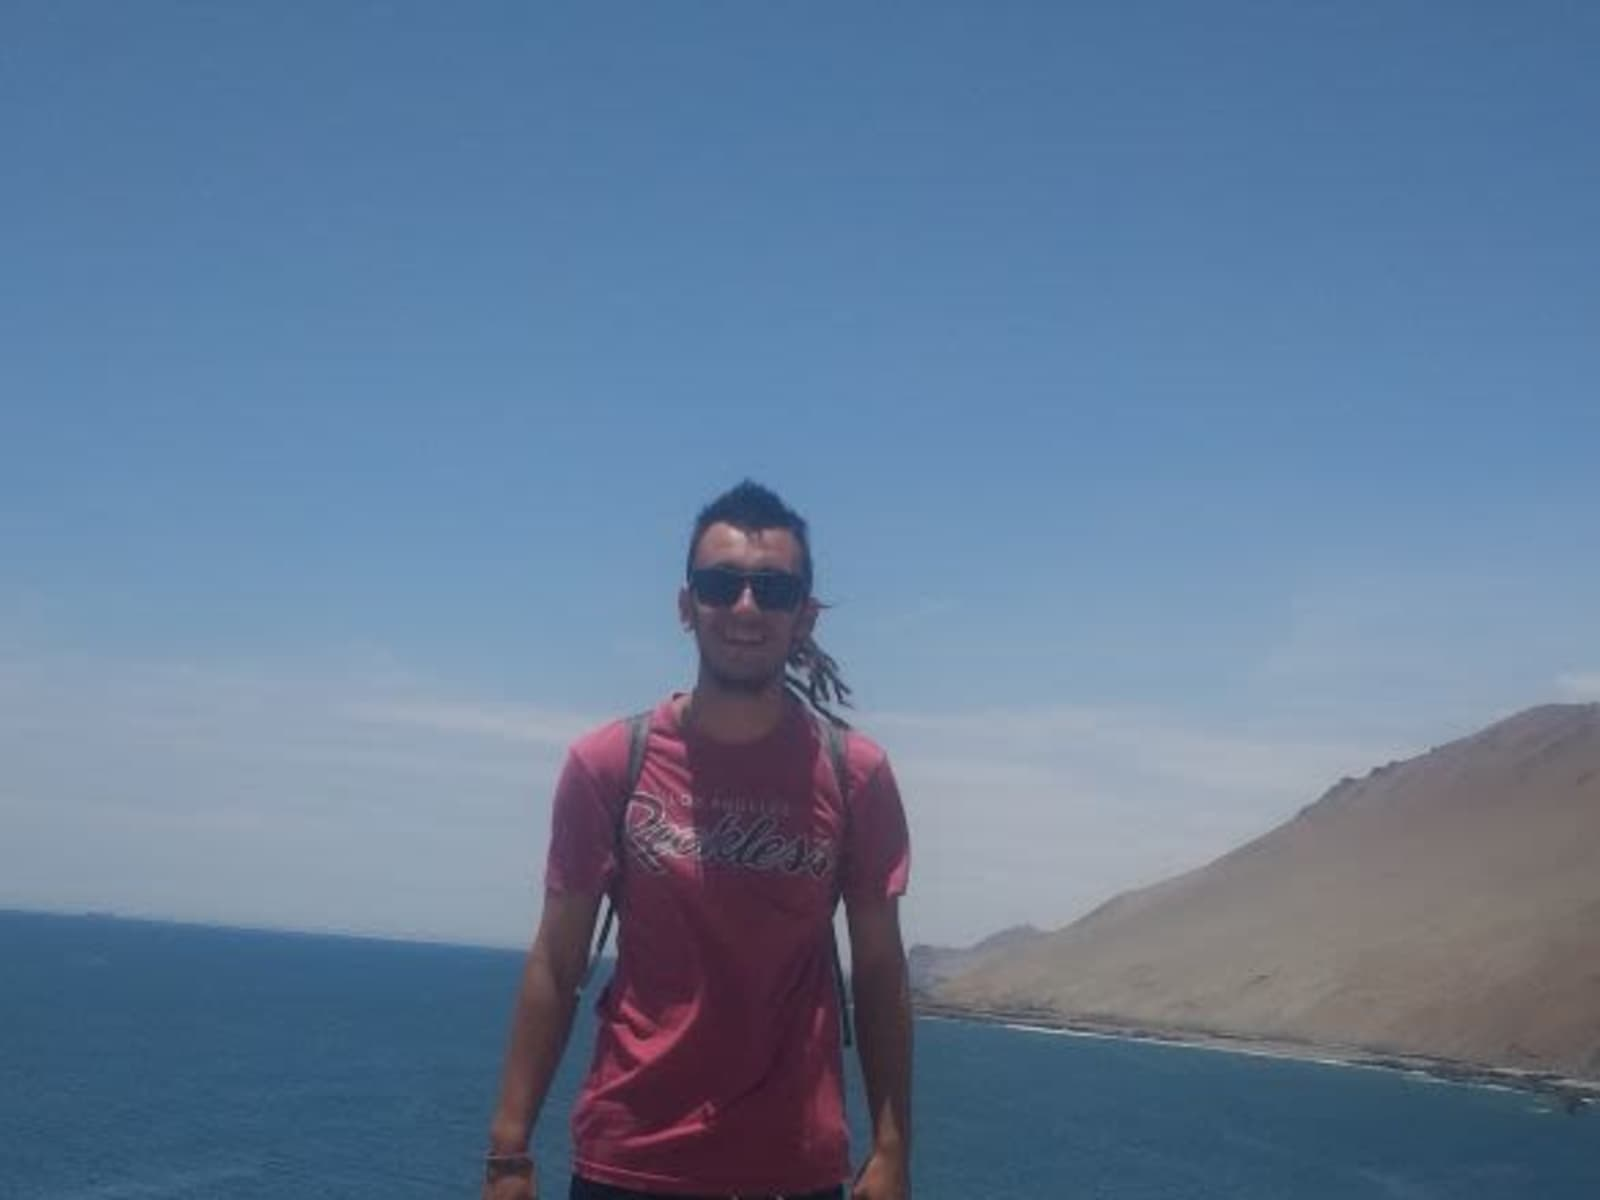 Cristian from Neuquén, Argentina